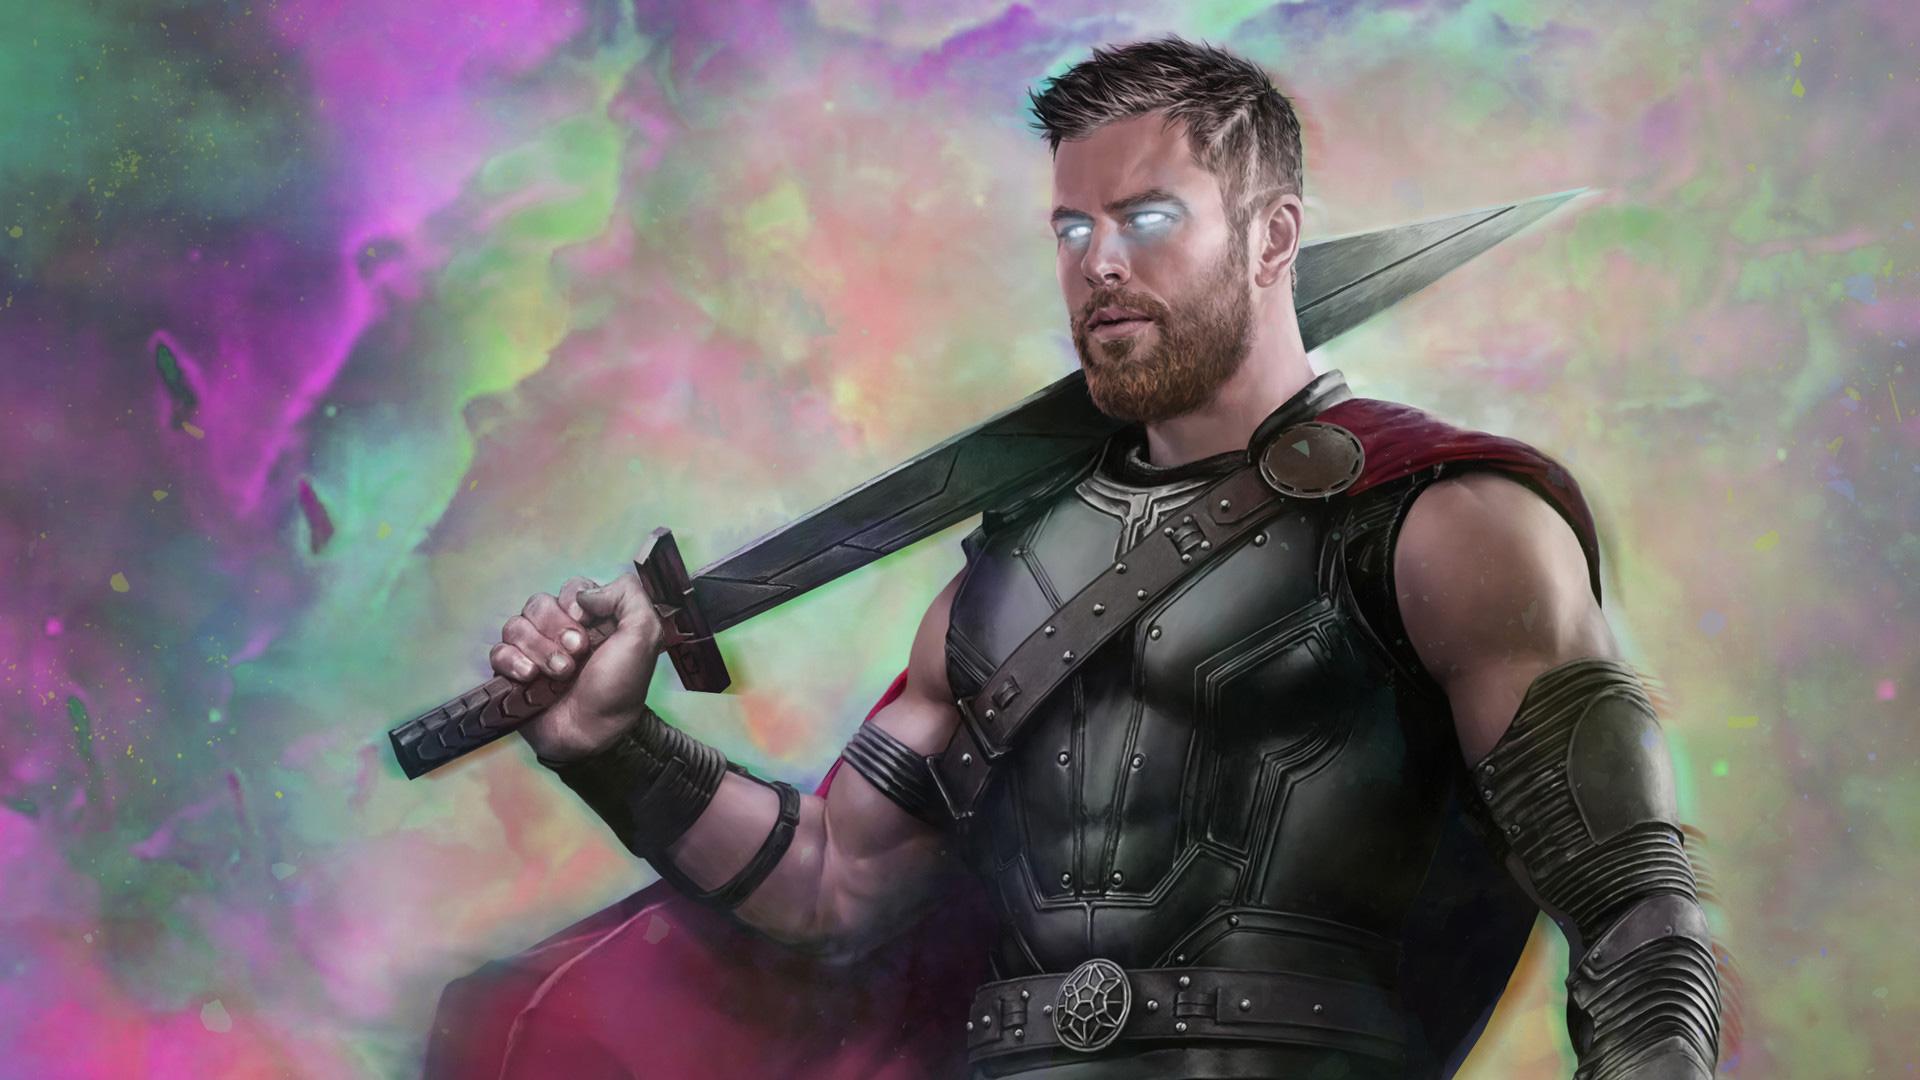 1920x1080 thor ragnarok movie art 2018 laptop full hd - Thor ragnarok hd wallpapers download ...